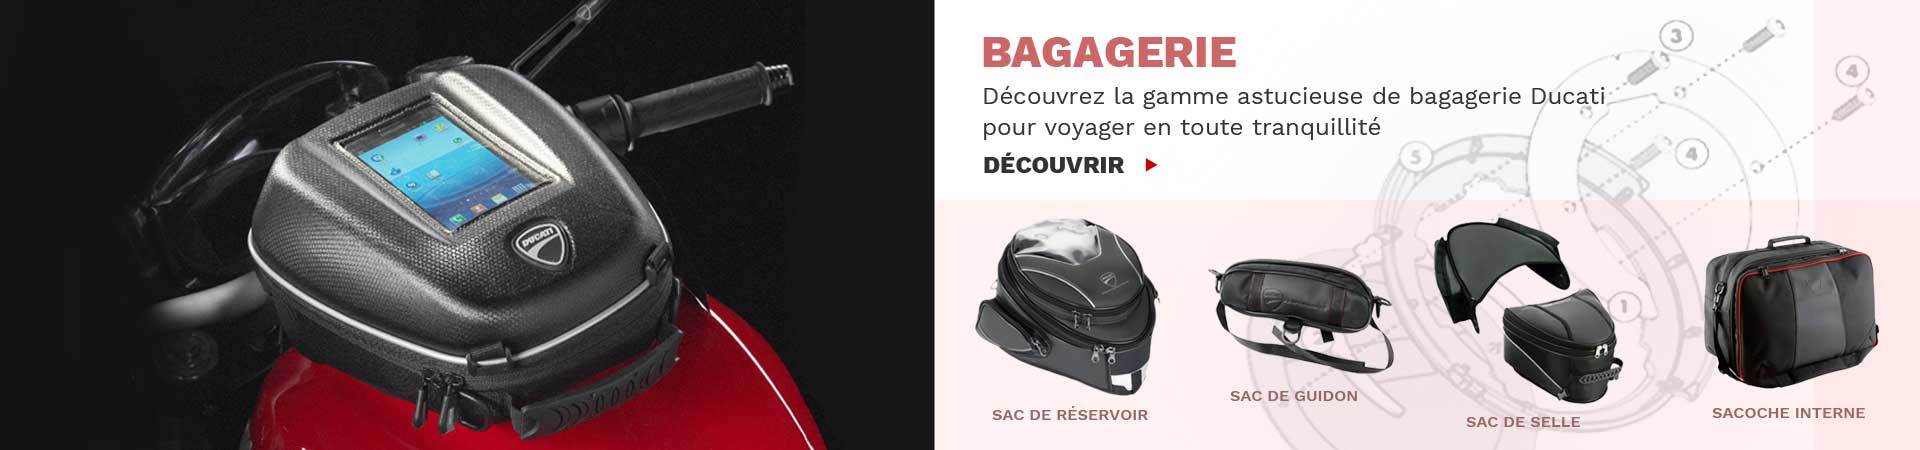 Bagagerie Moto Ducati